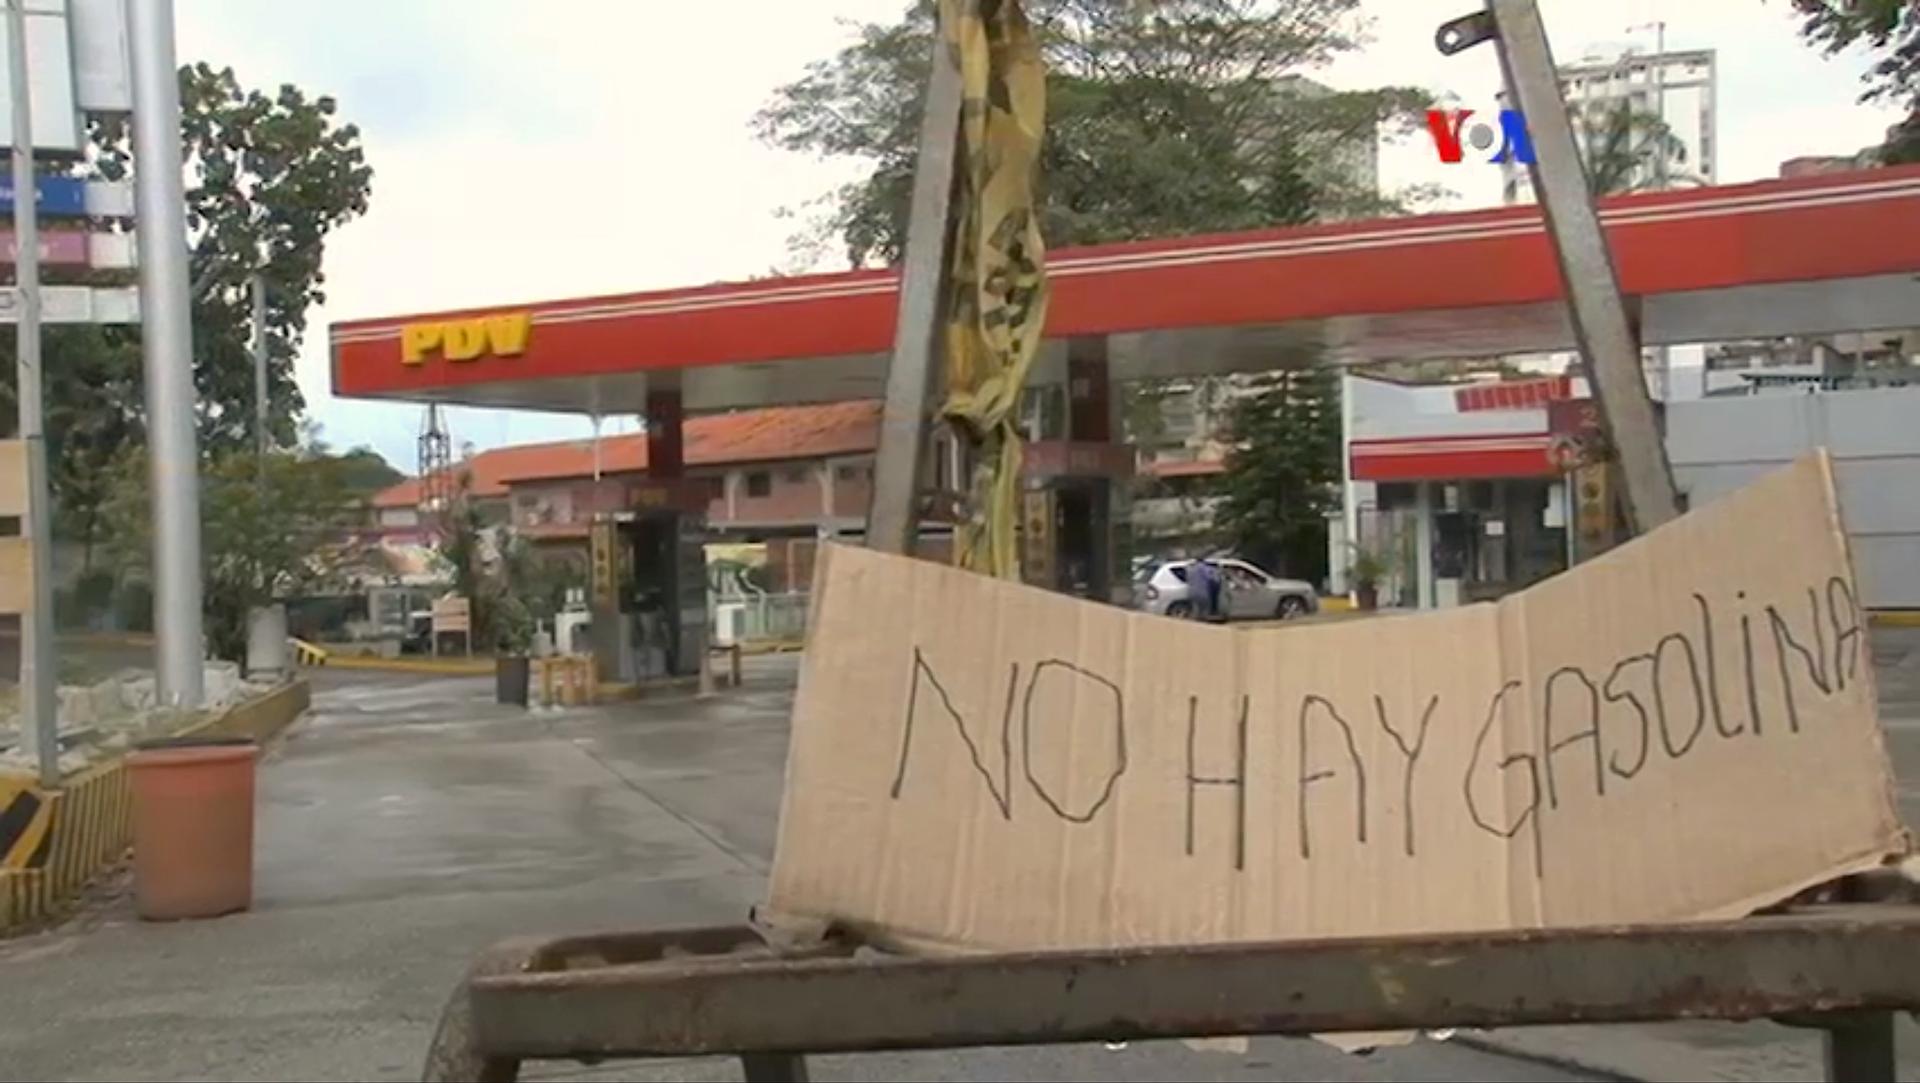 Venezuela Shows What Happens When Planners Pretend Prices Don't